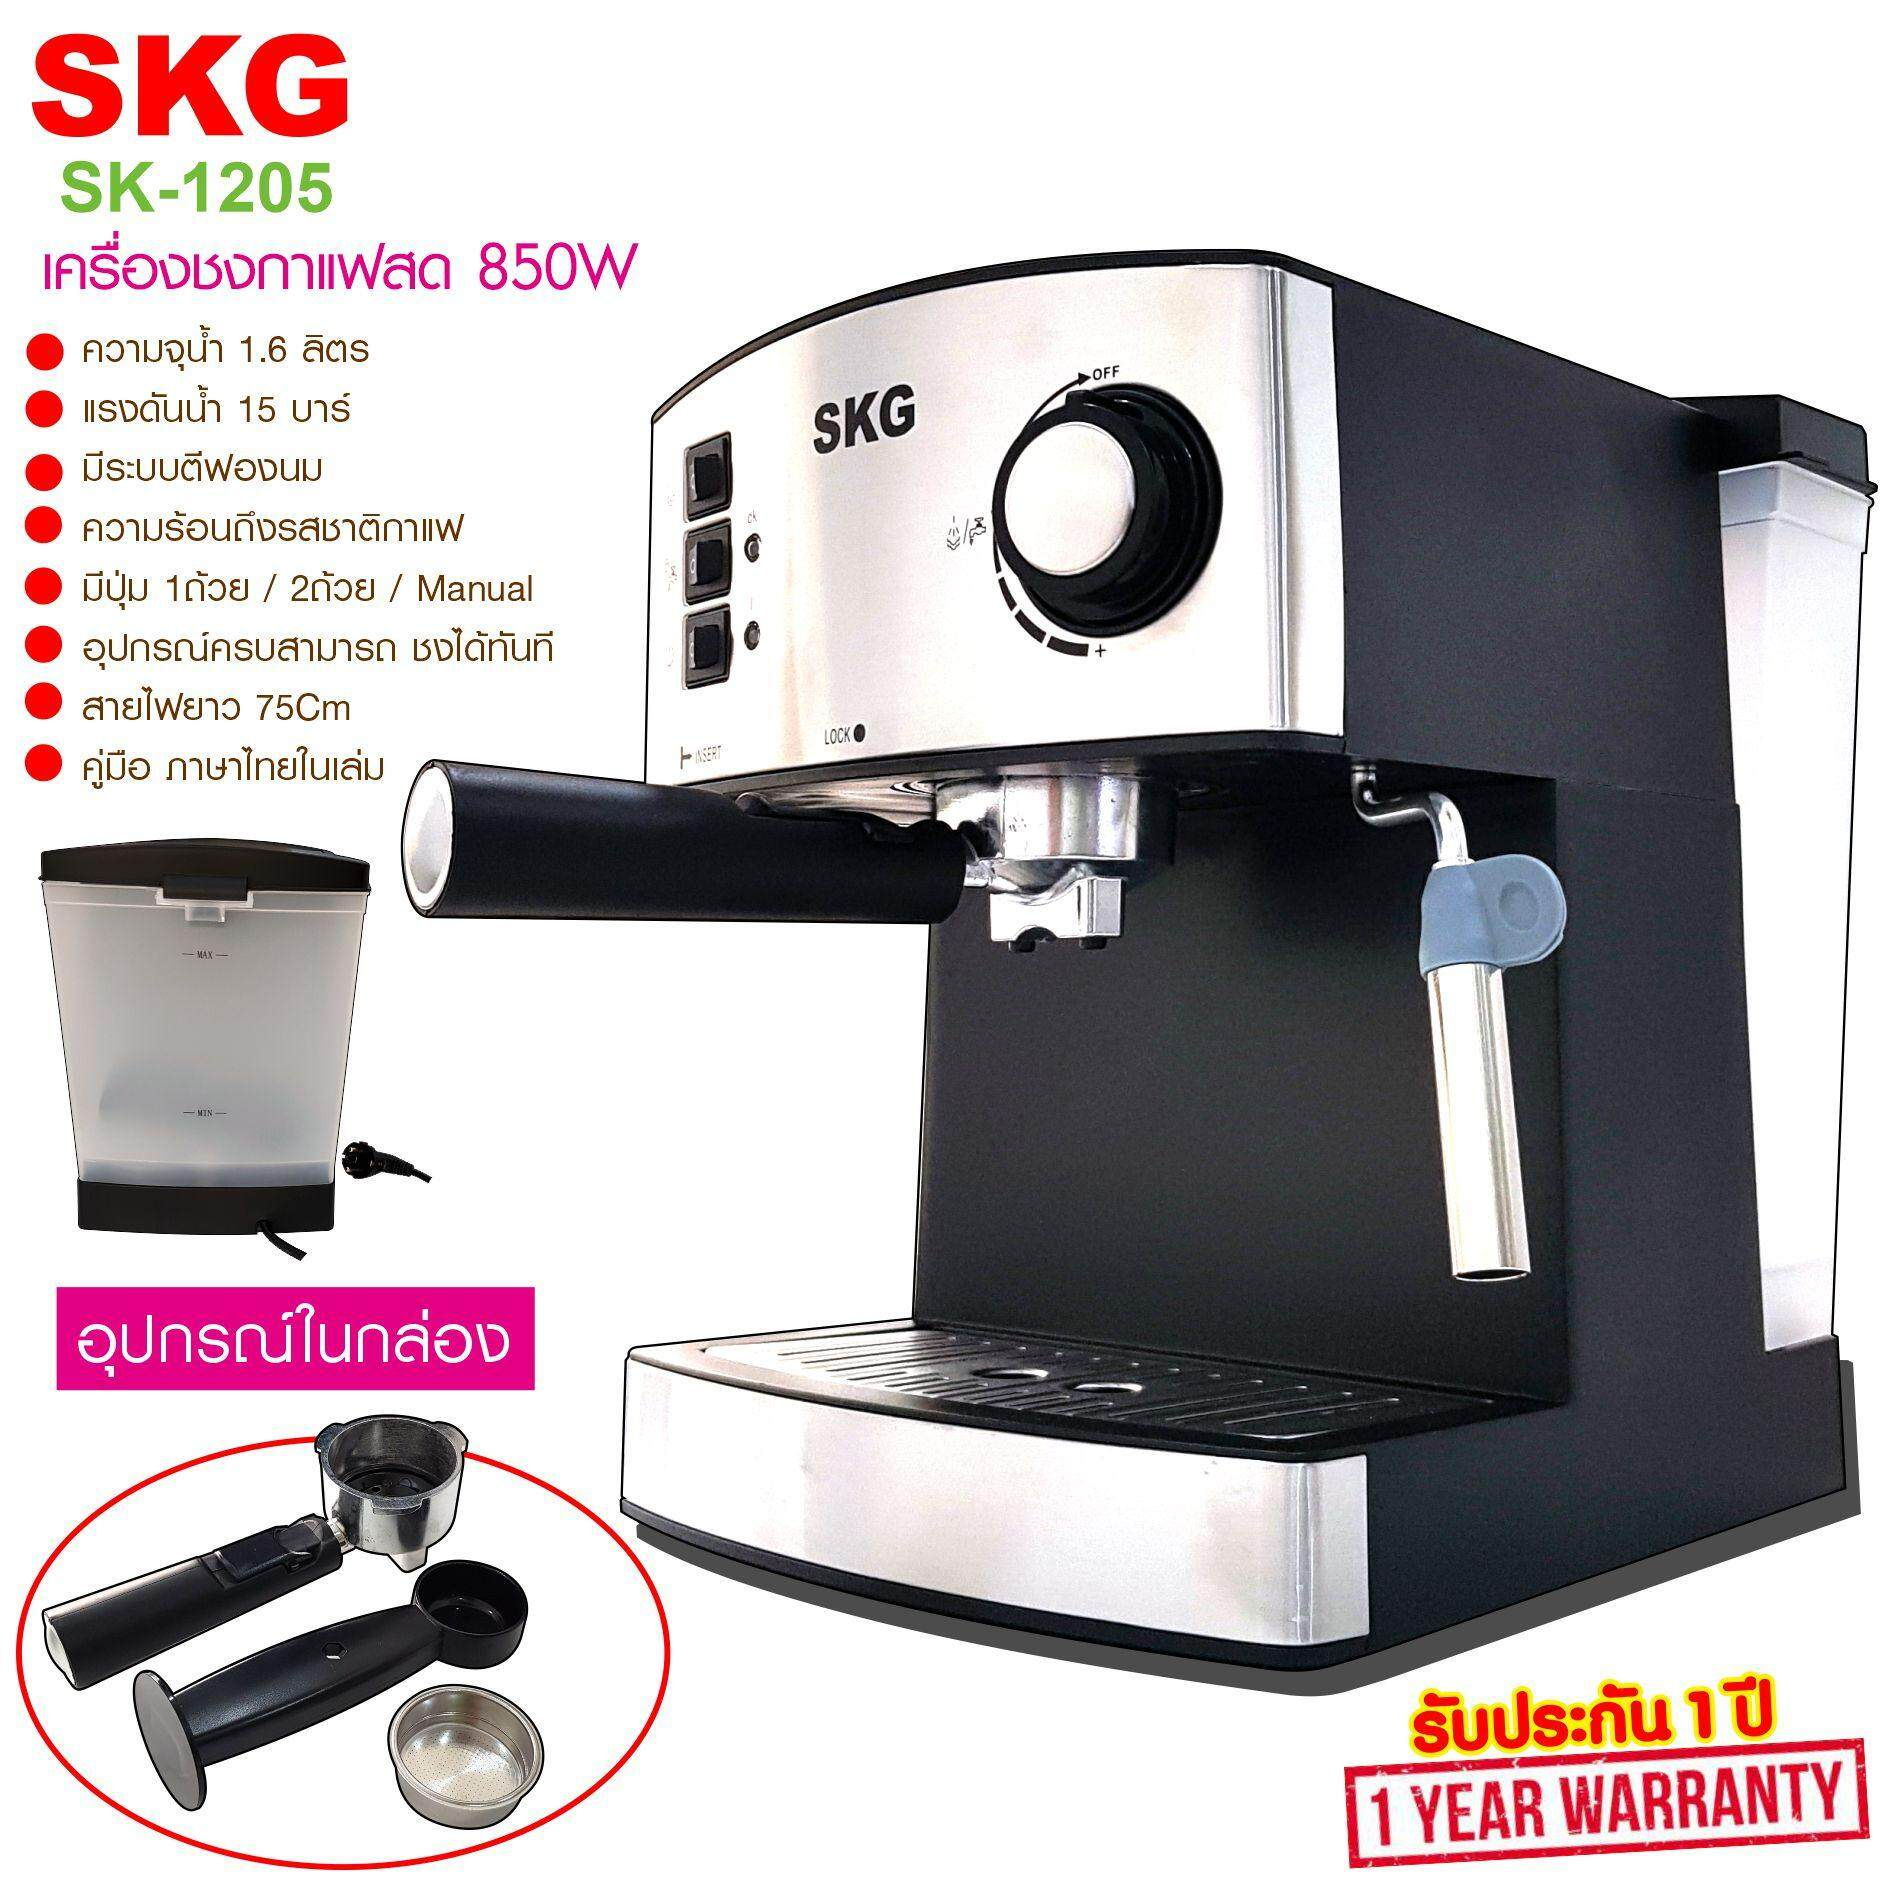 "SKG เครื่องชงกาแฟสด 850W 1.6ลิตร รุ่น SK-1205 สีเงิน  - b38e401b03ff743ca86fff3896eb0f86 - วิธีล้างหัวชงกาแฟด้วย ""UMI"" แบบใช้ BLIND RUBBER FILTER"